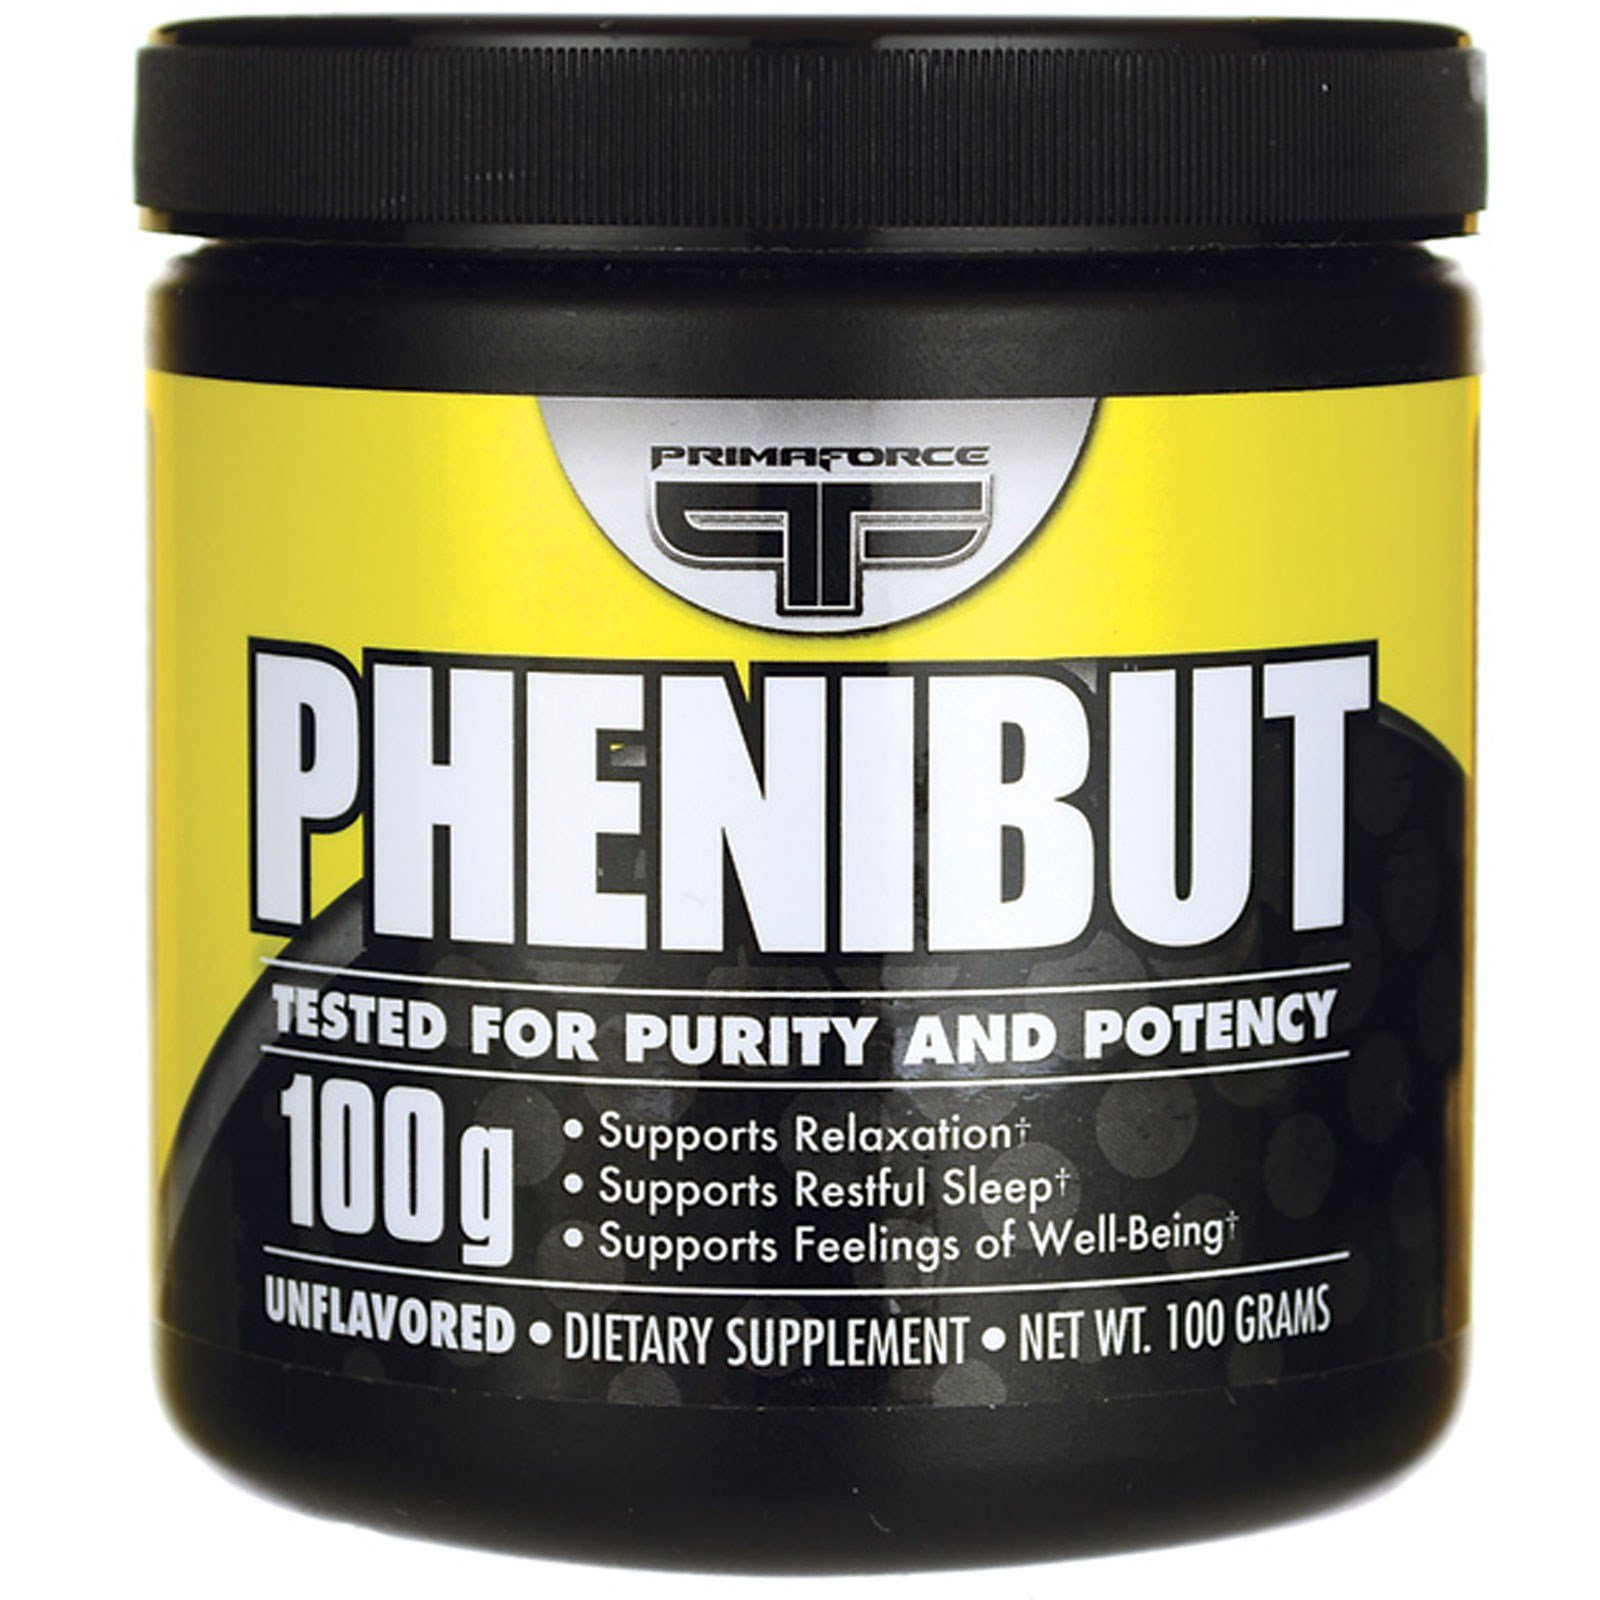 Primaforce, Phenibut, Unflavored, 100 g - iHerb com